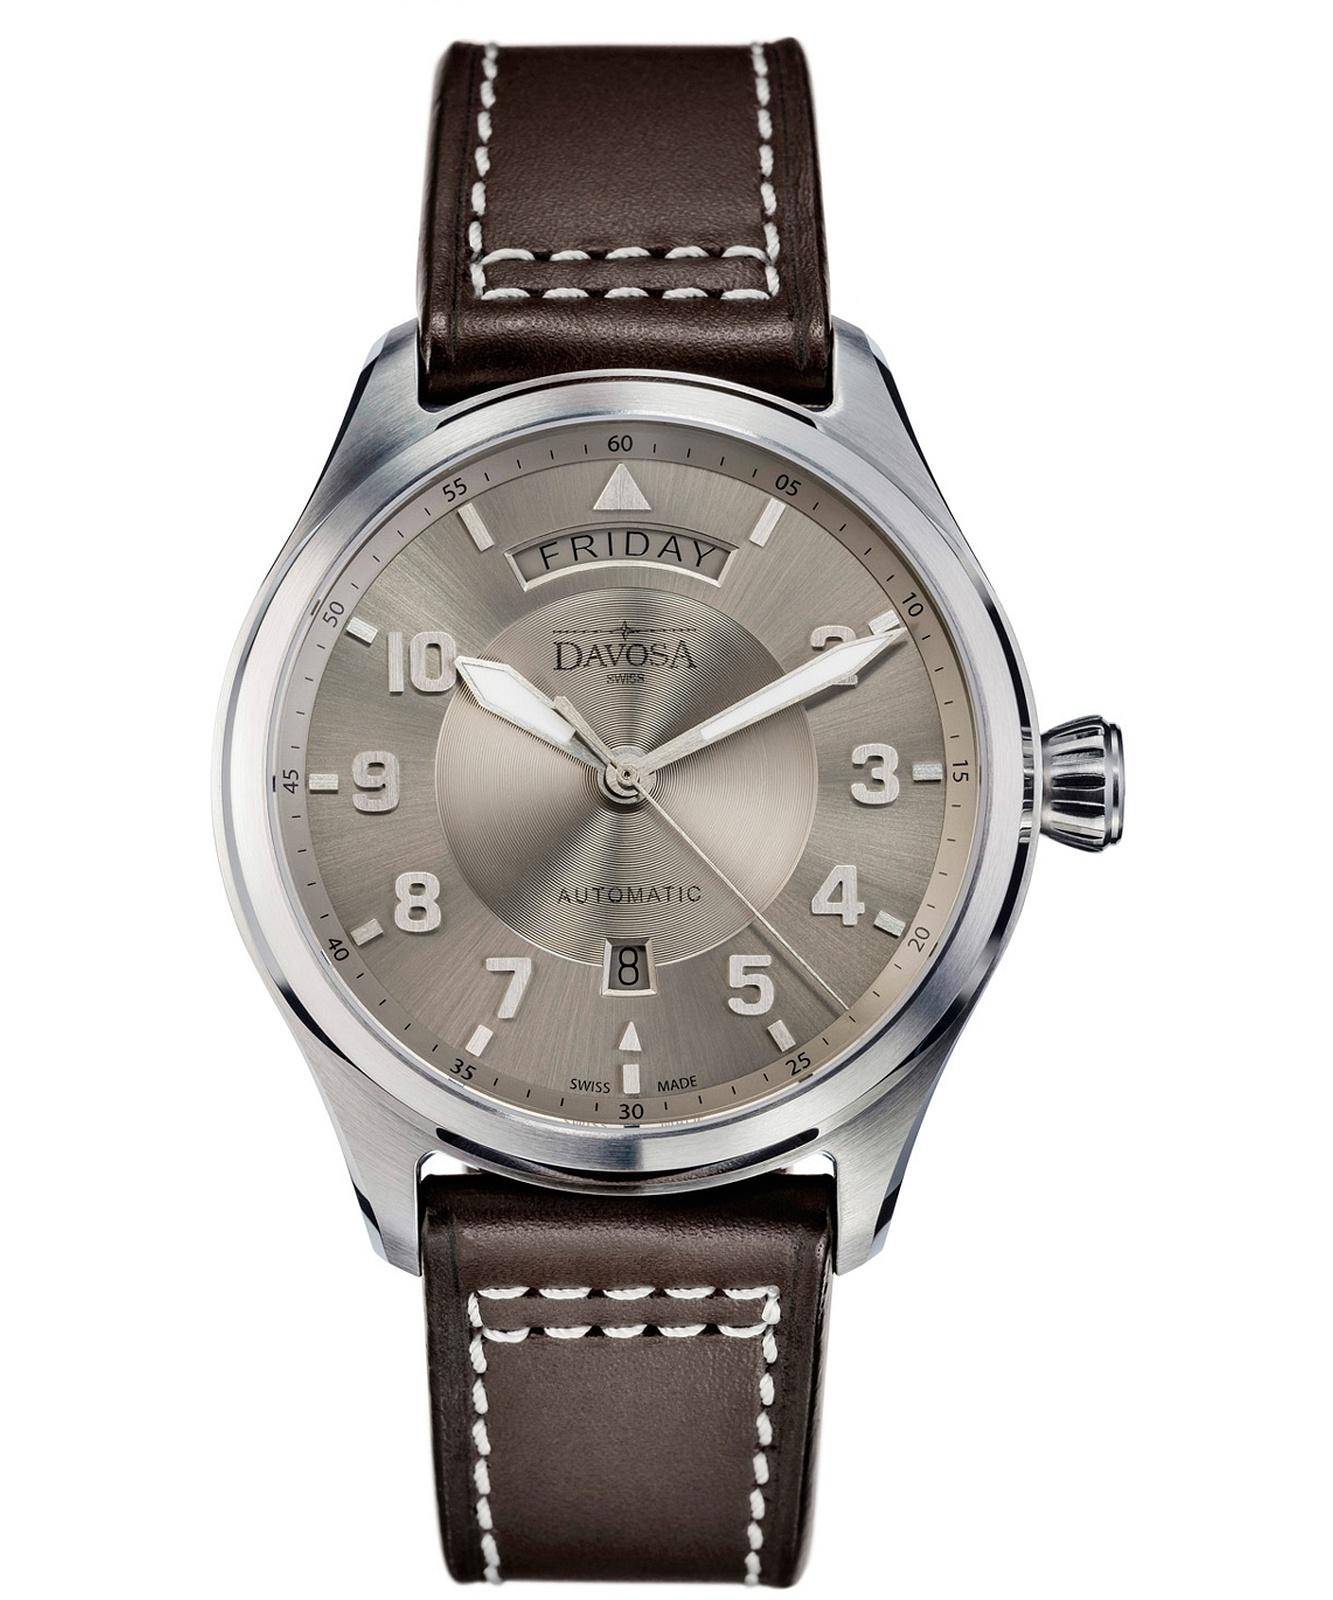 zegarek-meski-davosa-newton-pilot-day-date-automatic-161-585-15